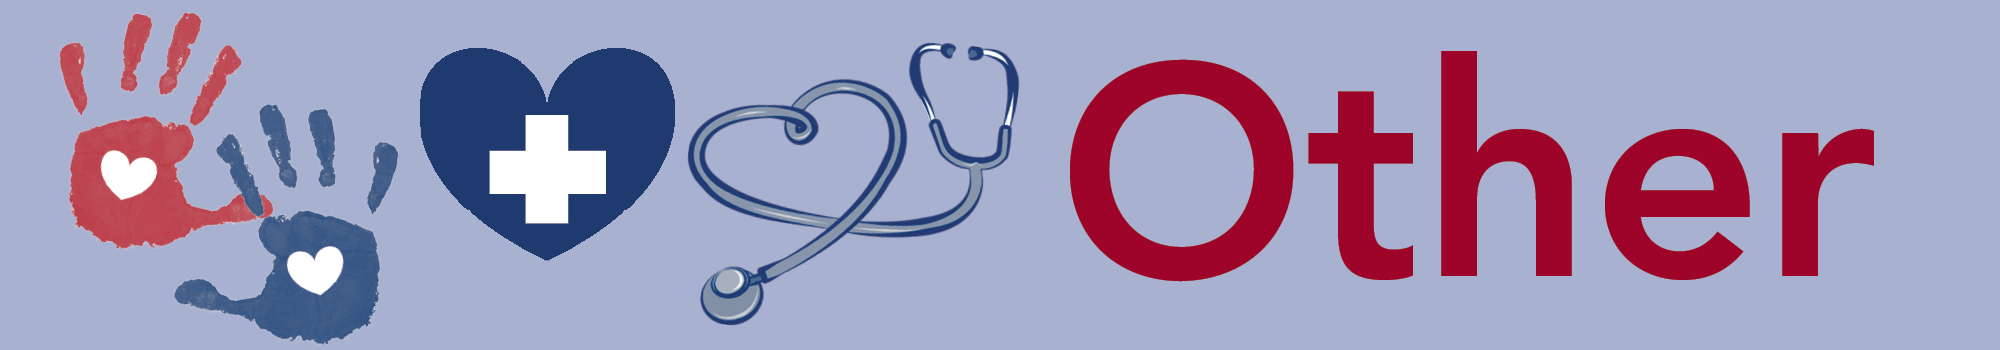 hospital healthsystems REAL8